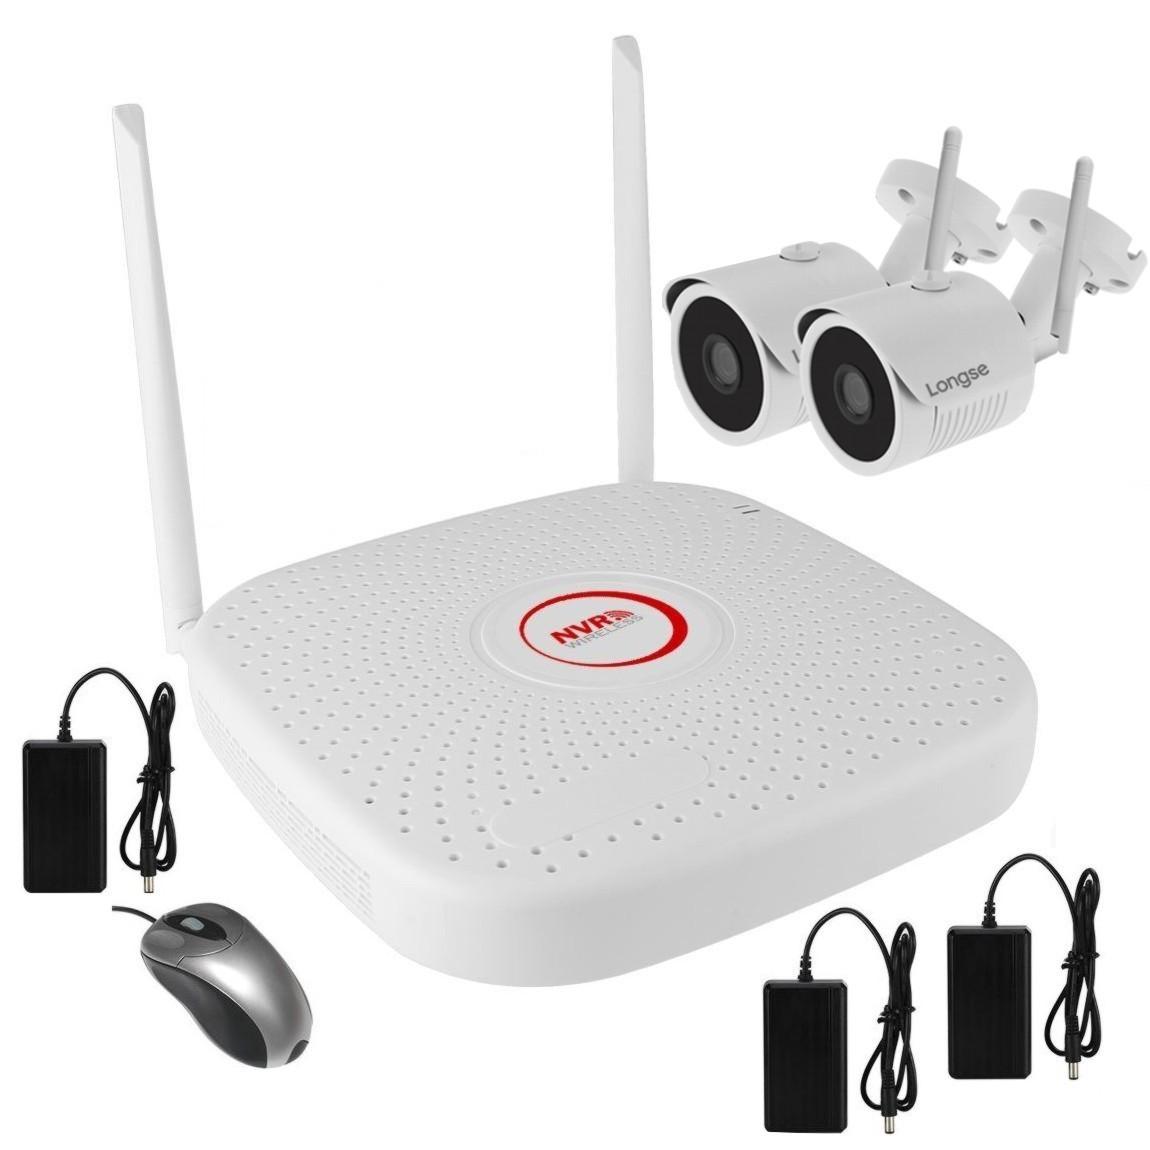 Комплект беспроводного WiFi видеонаблюдения на 2 камеры 1 Мп на 300 метров LONGSE WIFI2004PG1S100-2